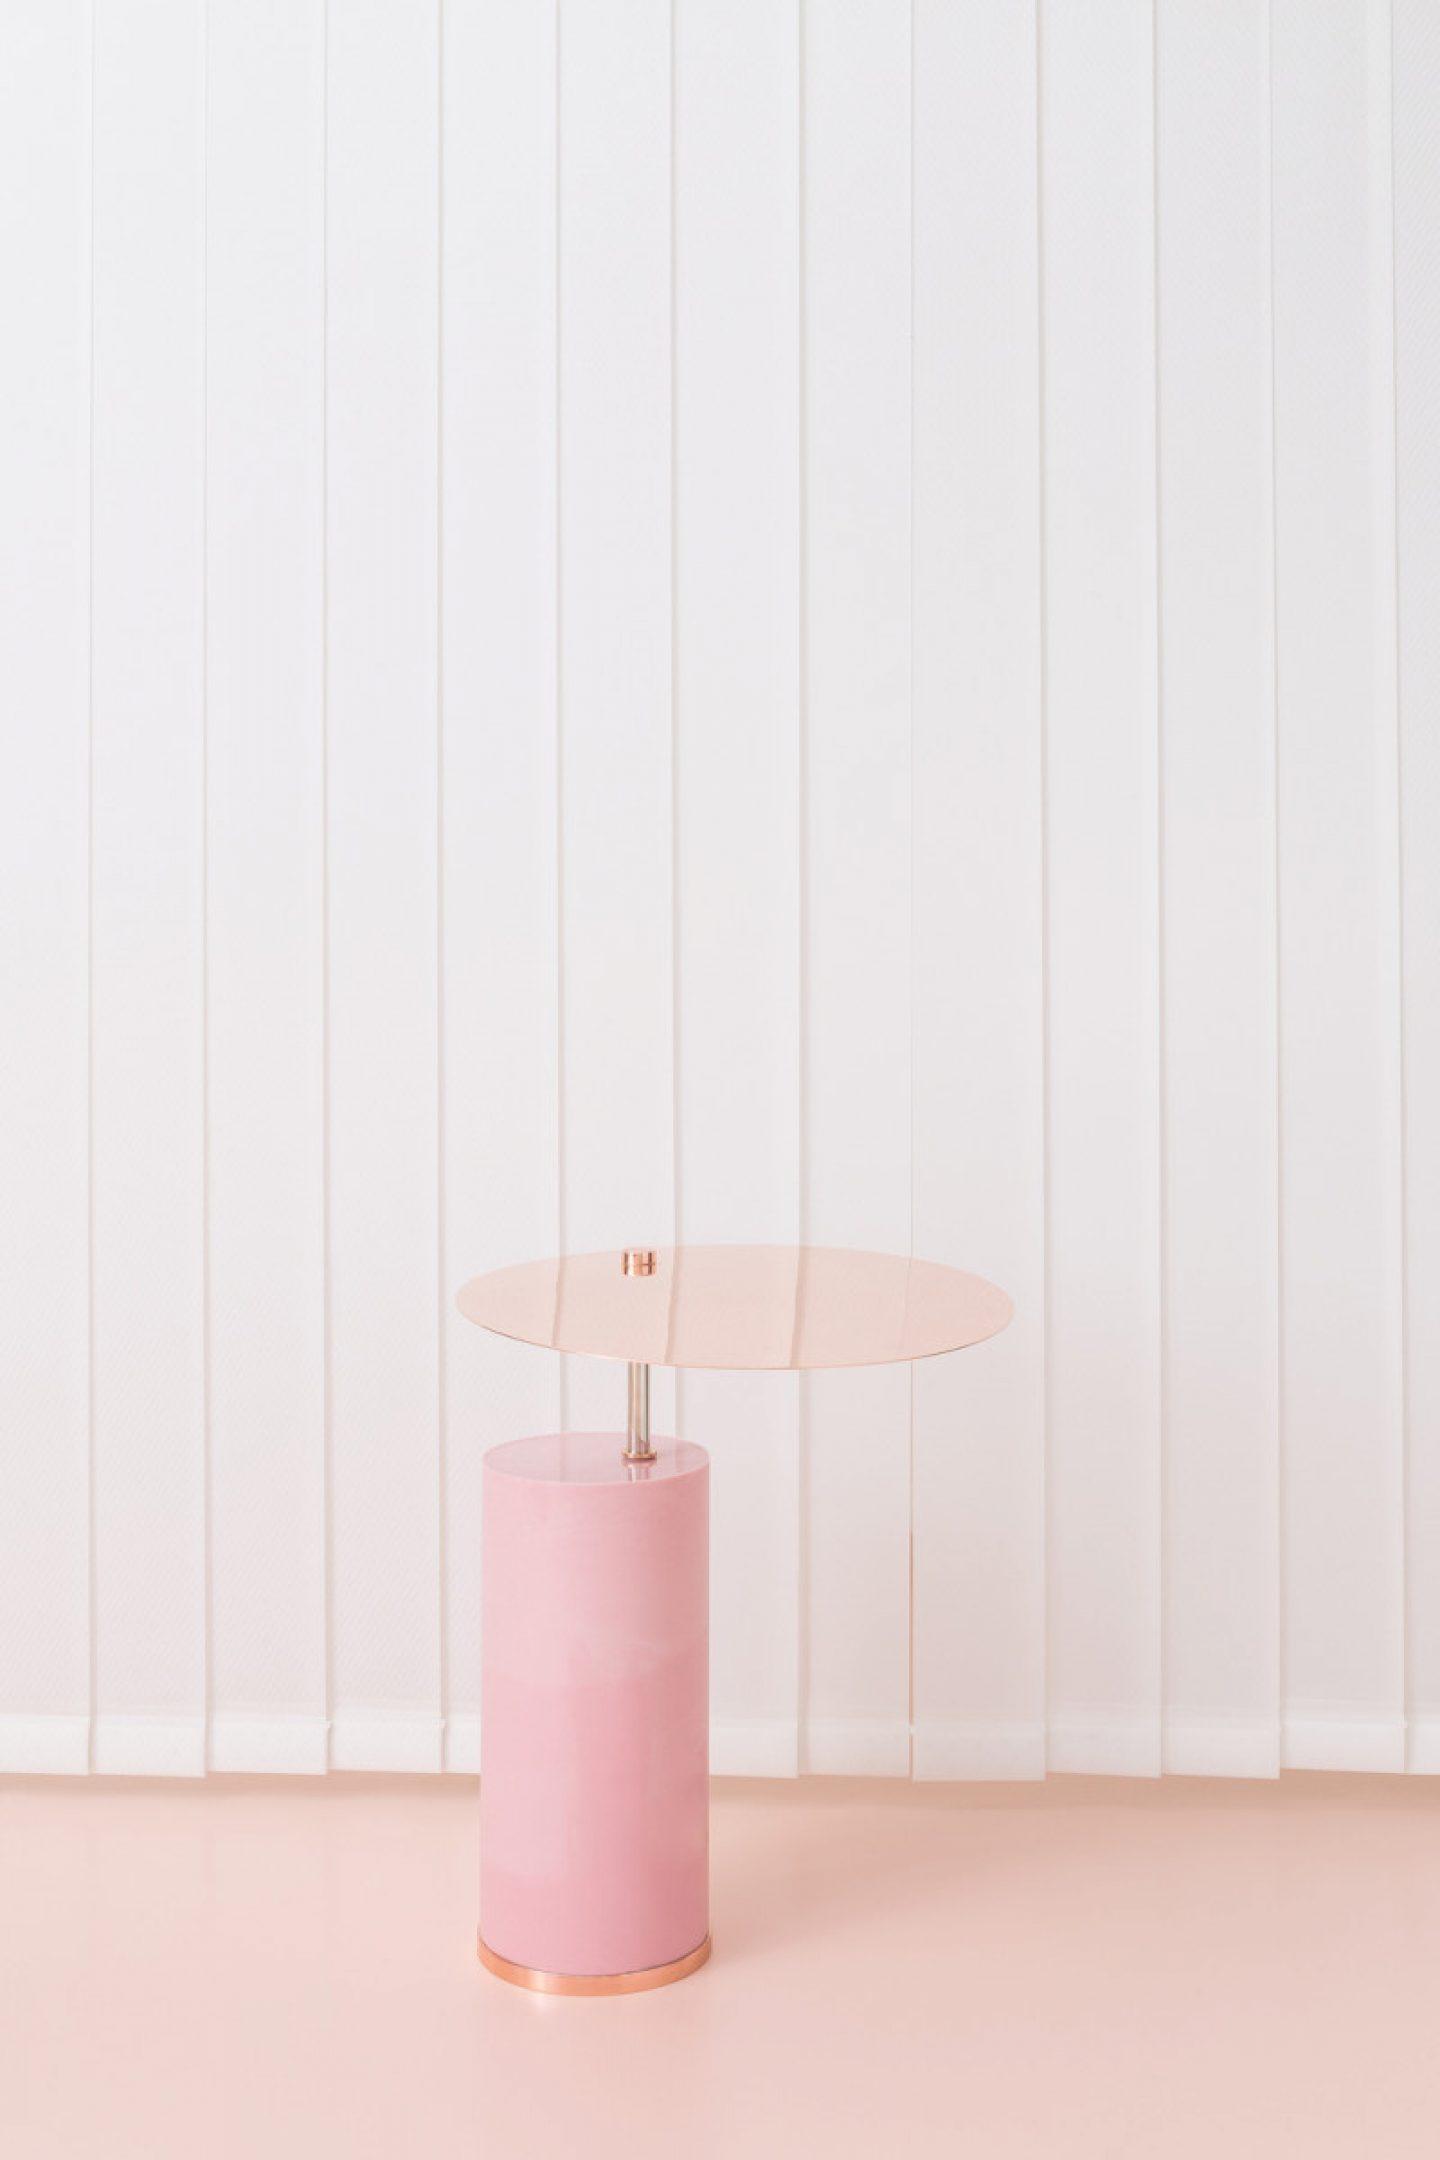 Atelier_Biagetti_Design_ninfea